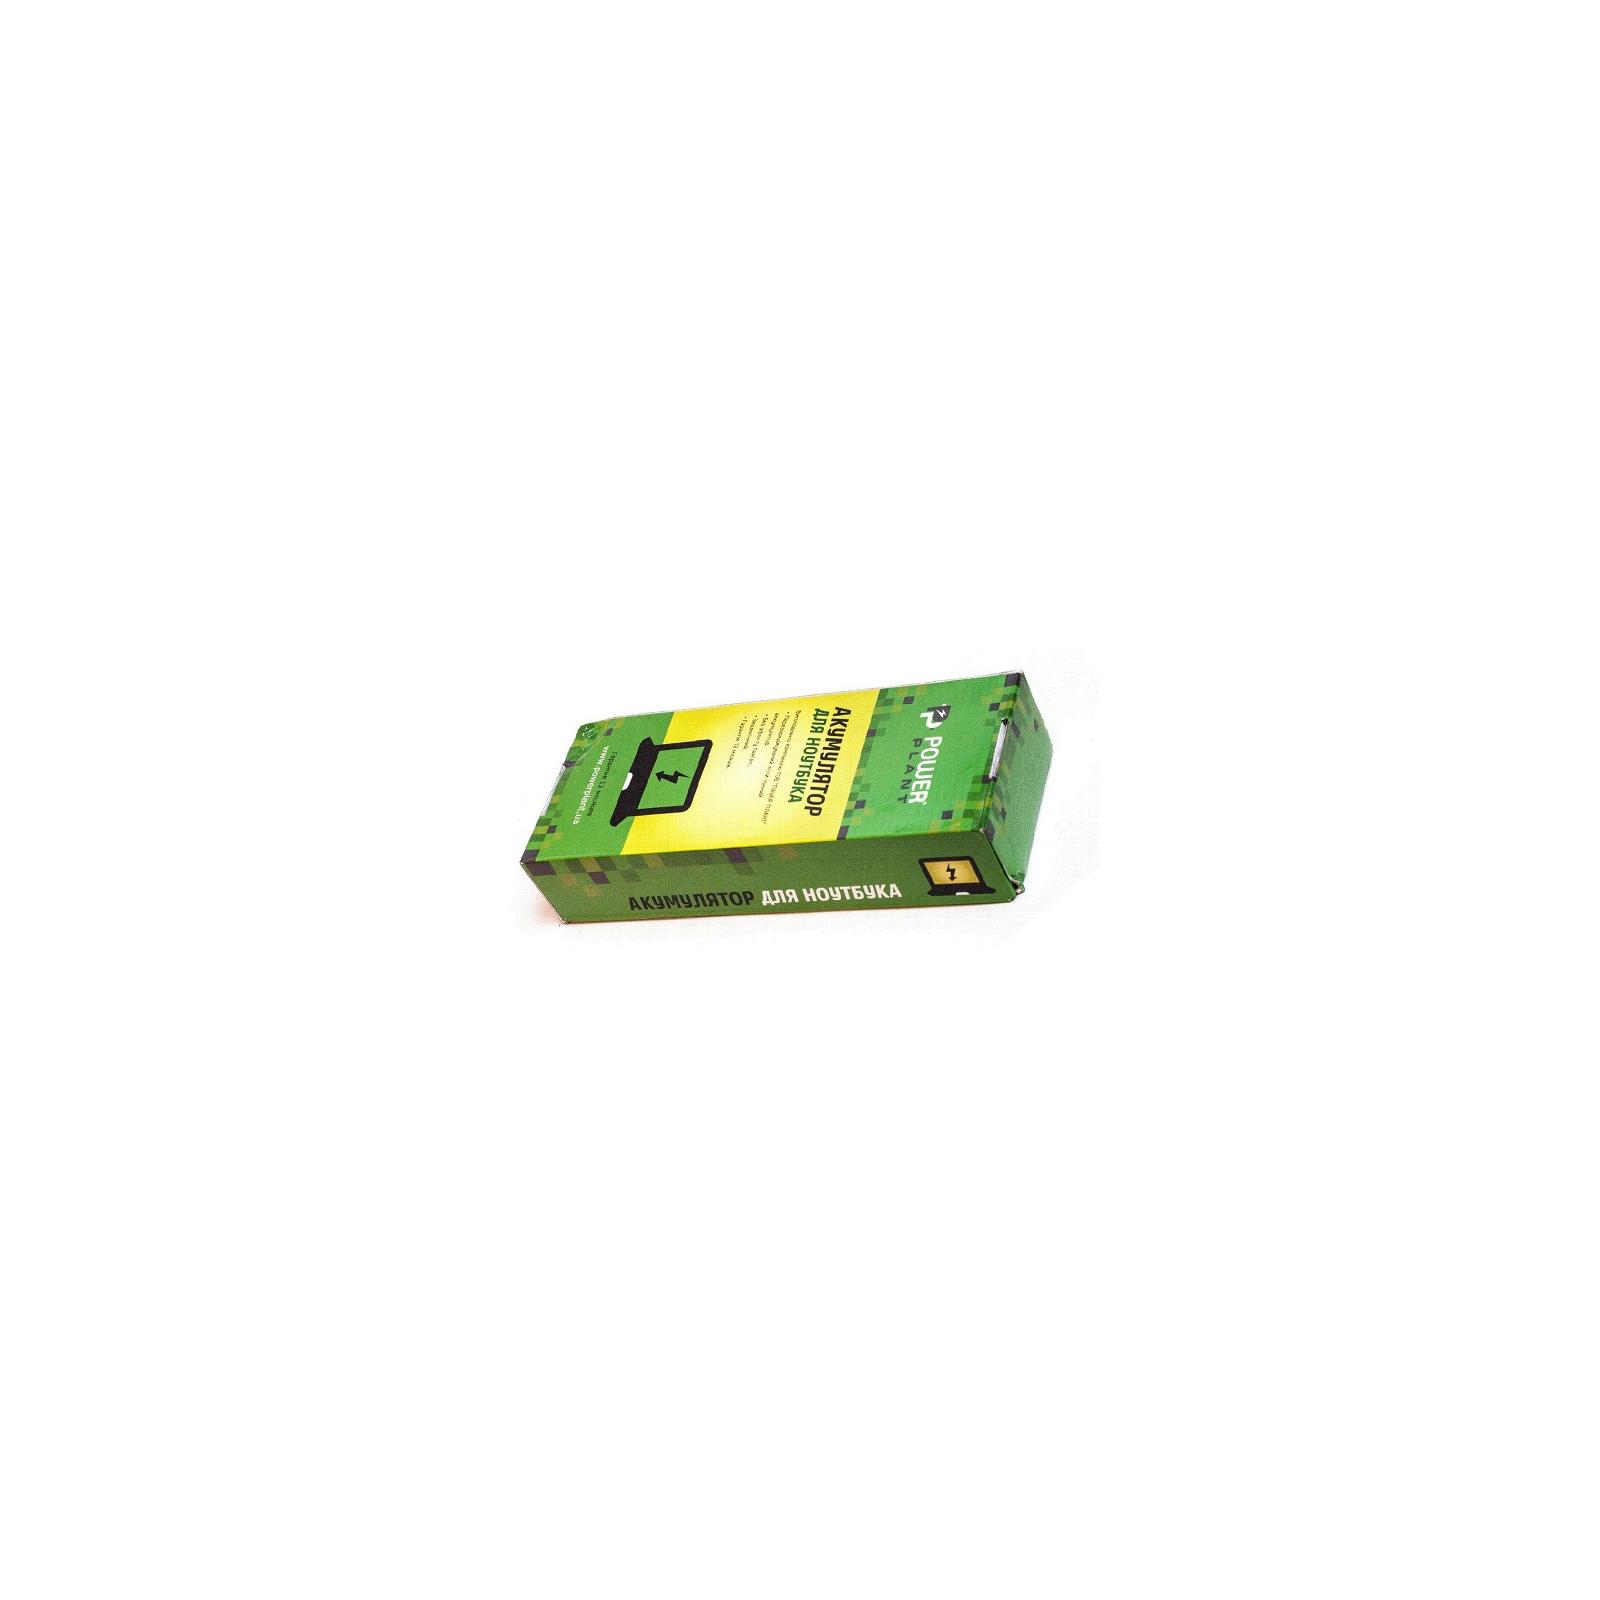 Аккумулятор для ноутбука DELL Latitude E5400 (KM742, DLE540LH) 11.1V 5200mAh PowerPlant (NB00000116) изображение 3